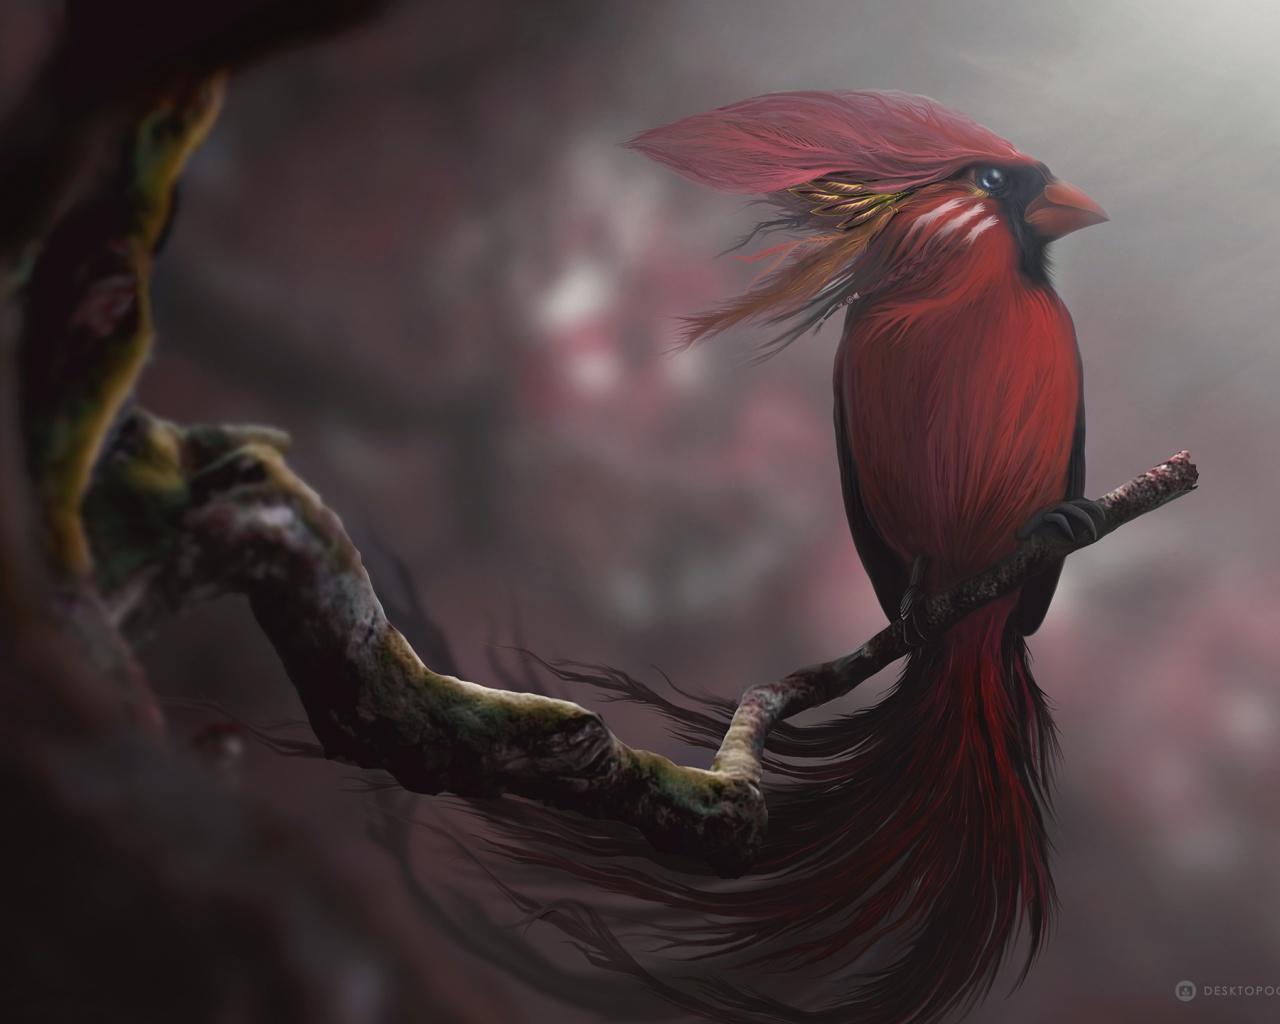 spirit_bird_1280x1024